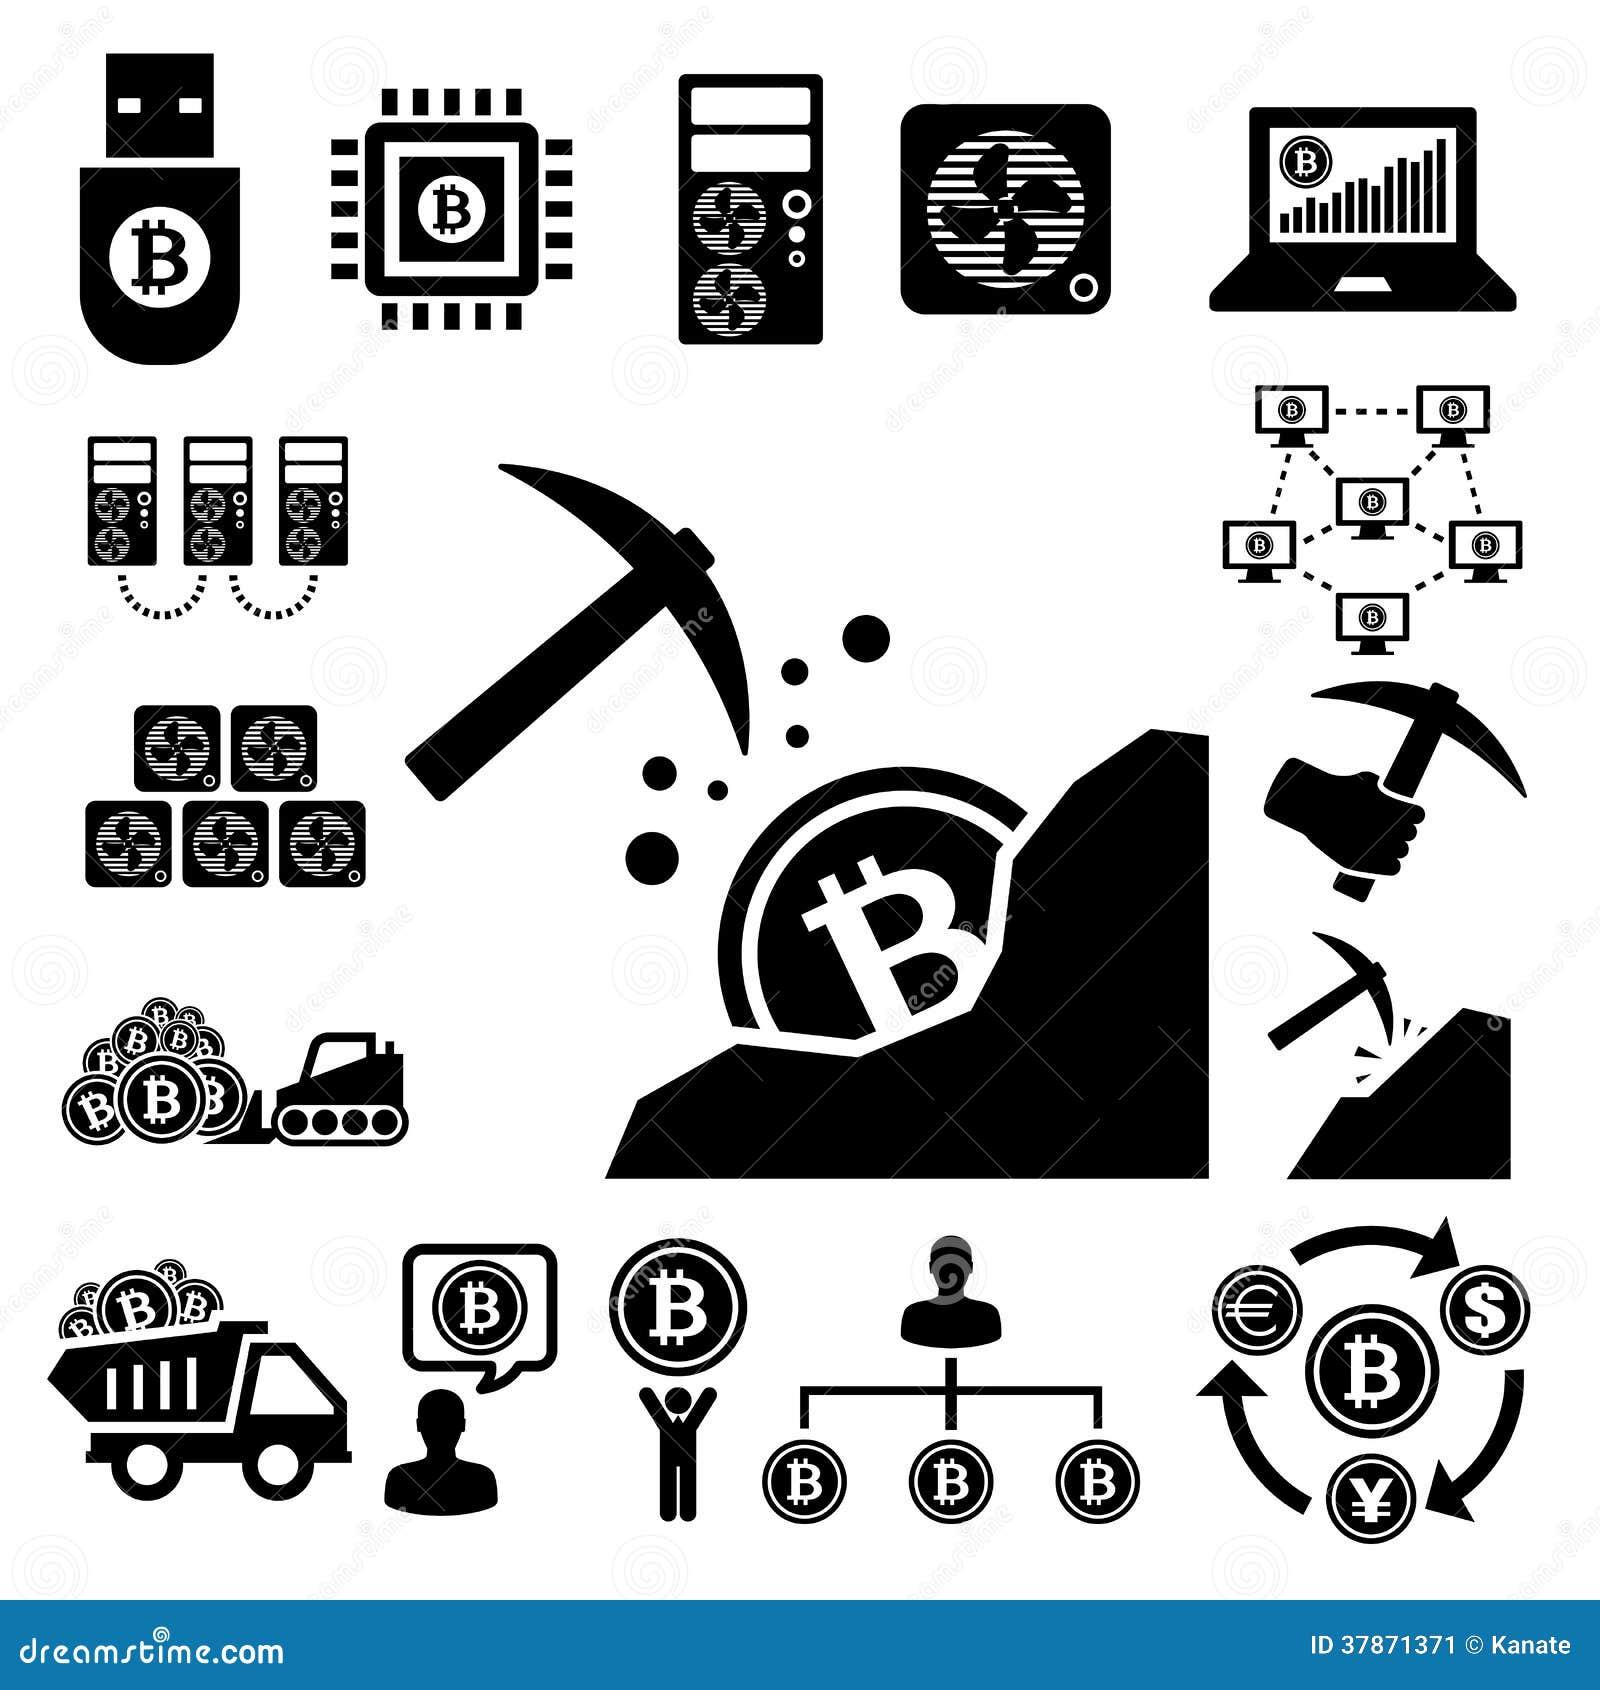 Bitcoin Icons Set Stock Image - Image: 37871371